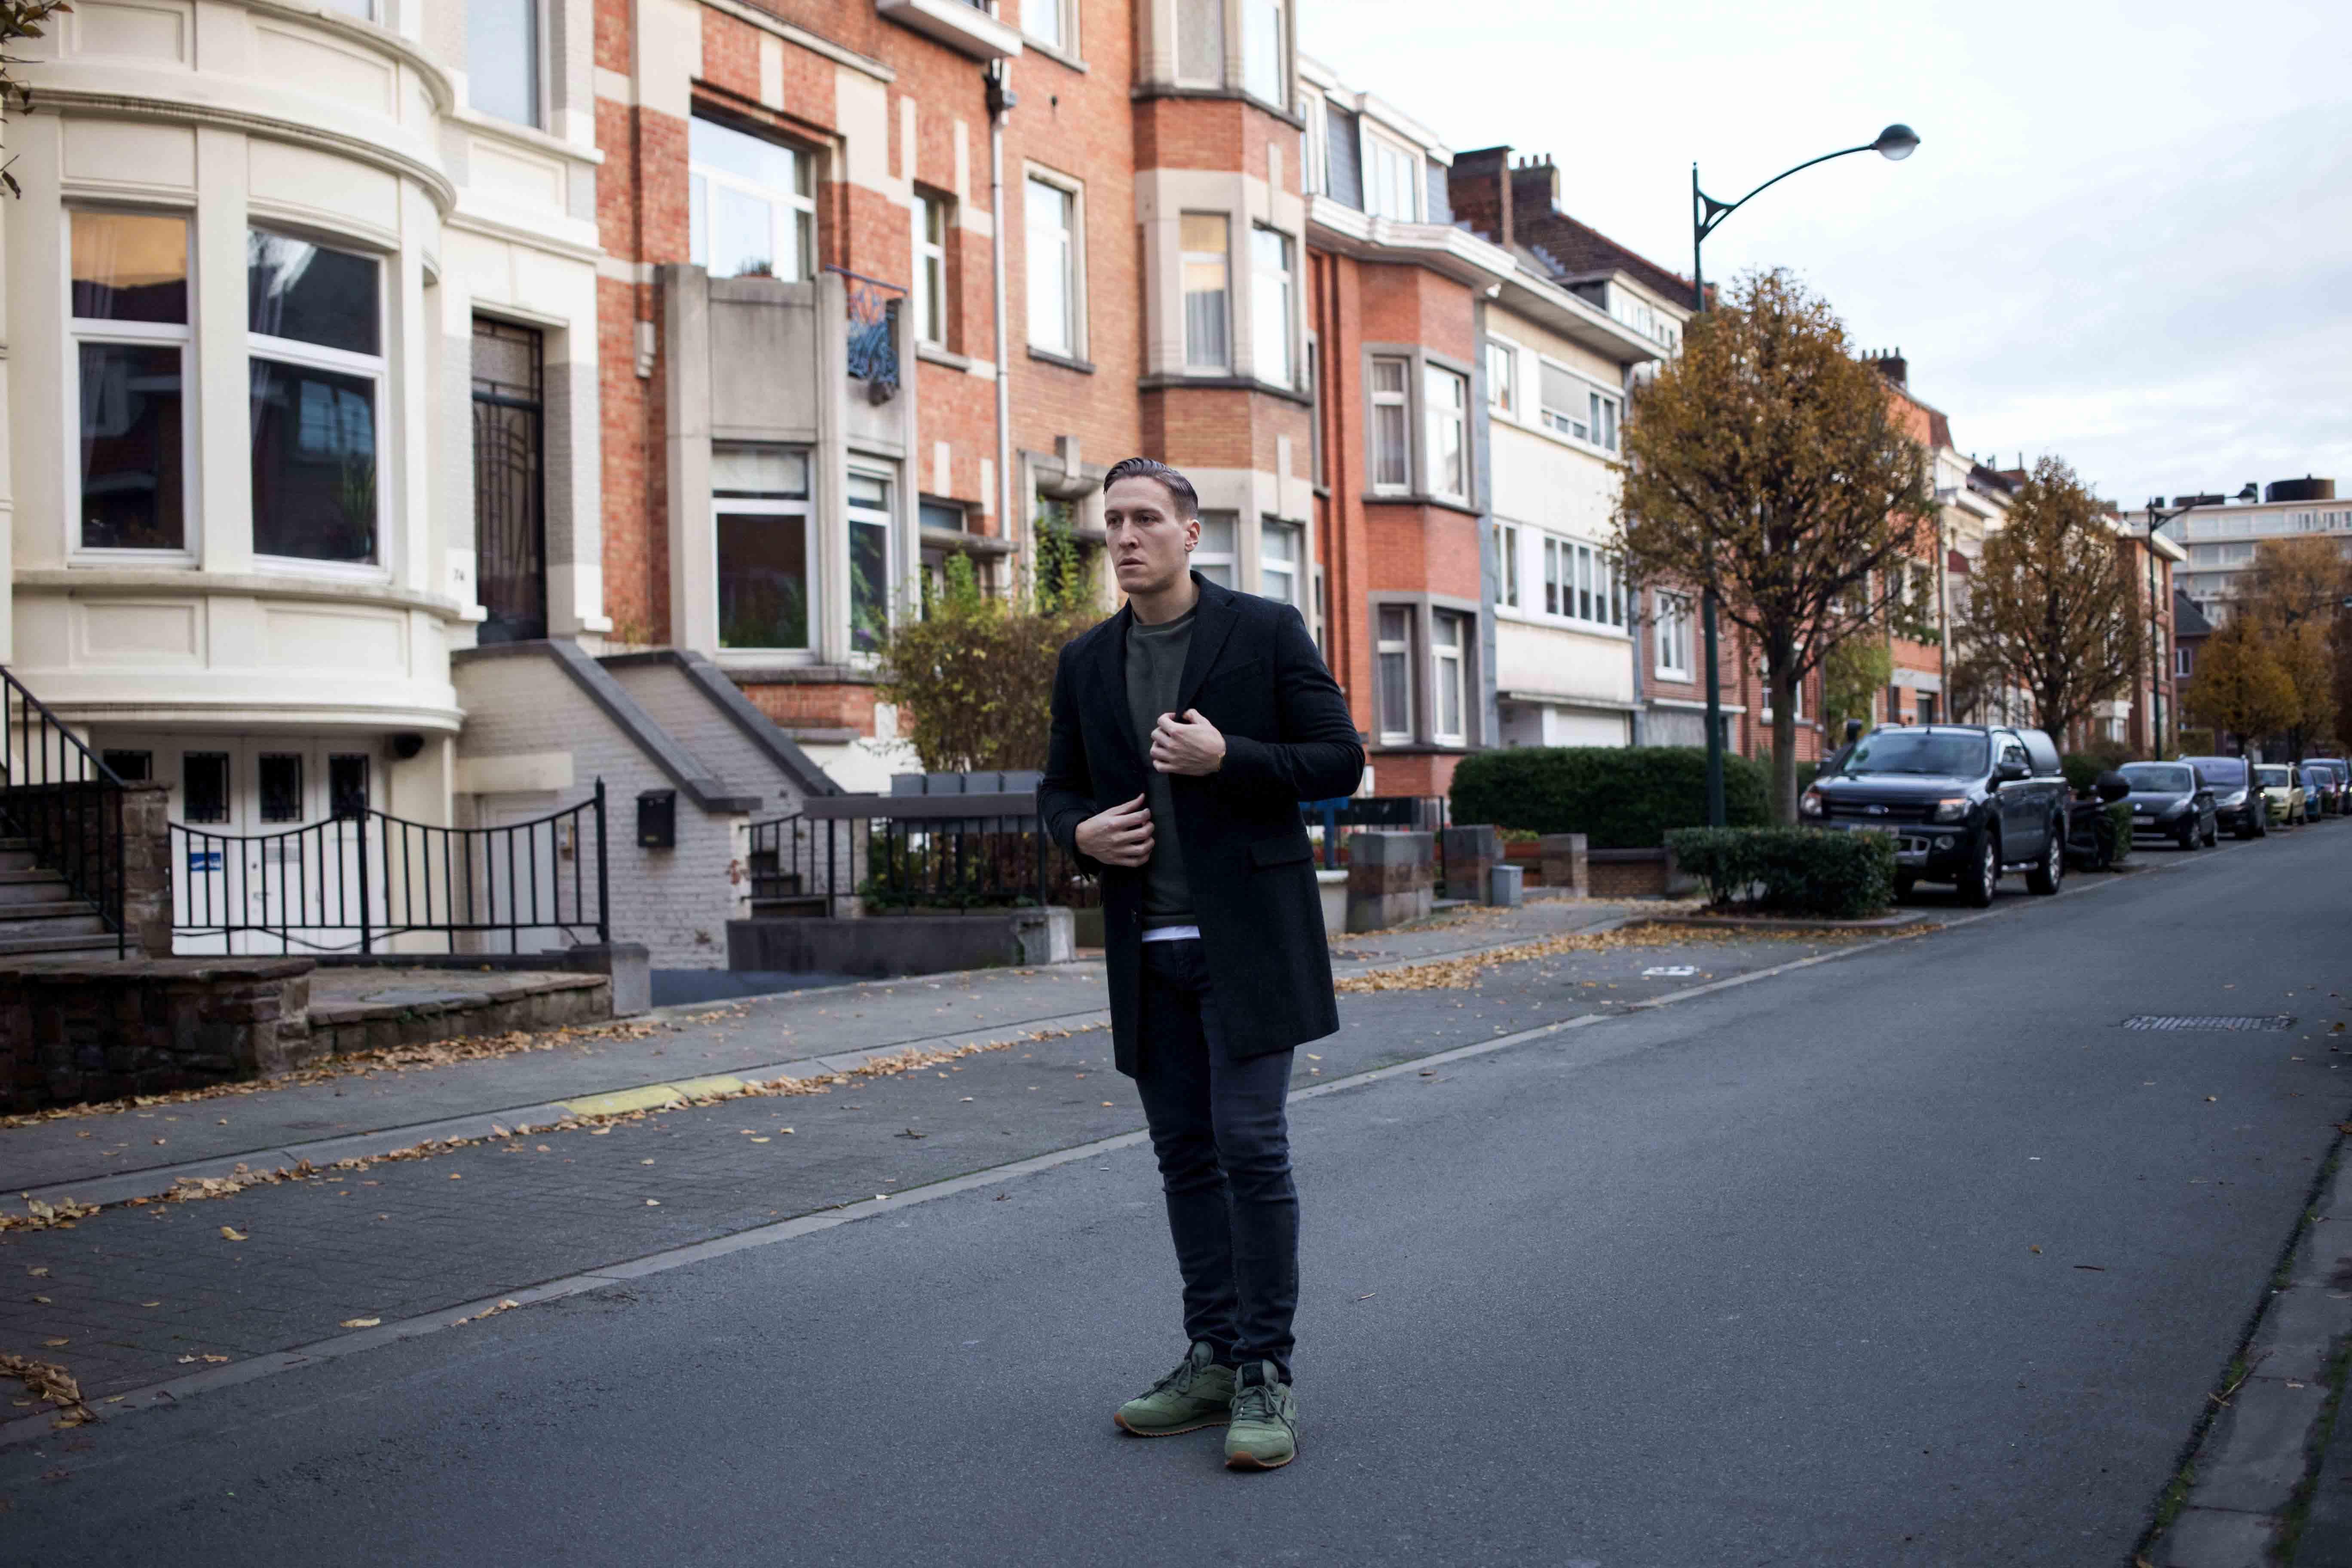 gruener-sweater-gruene-sneaker-modern-street-style-look-casio-uhr-modeblog-maennermode-berlin_8497